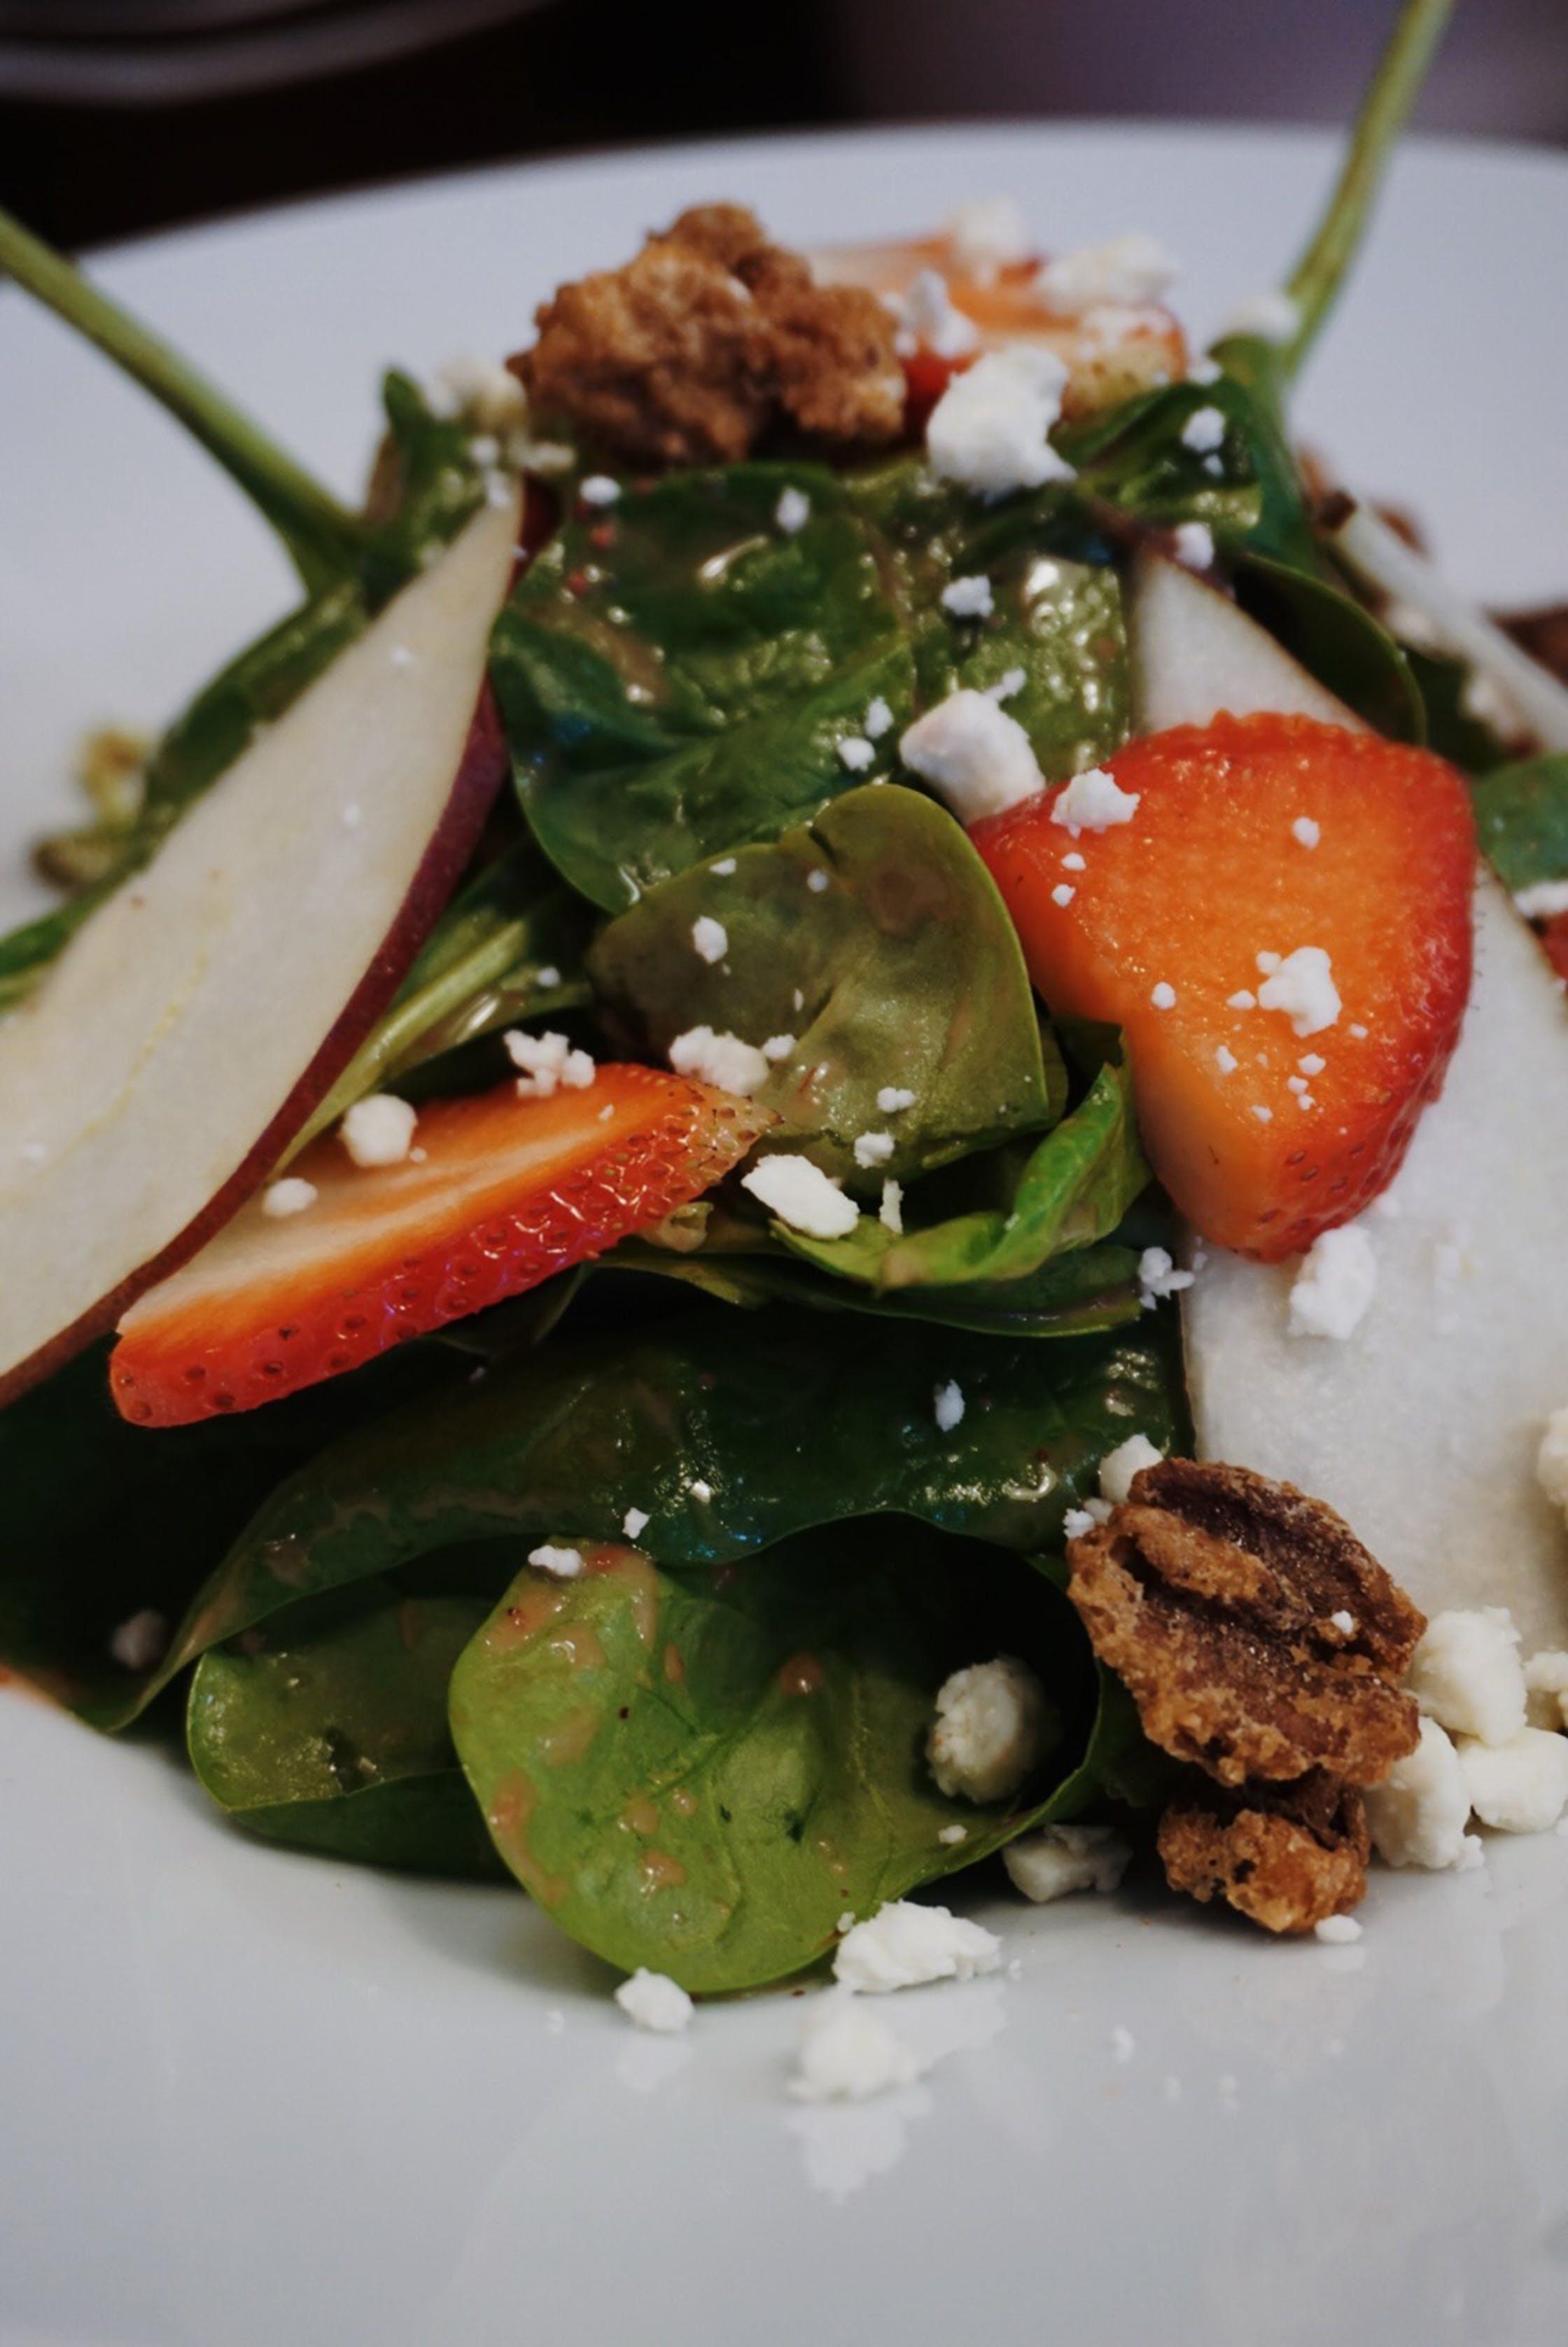 Foto profissional grátis de alimento, almoço, Aperitivo, delicioso